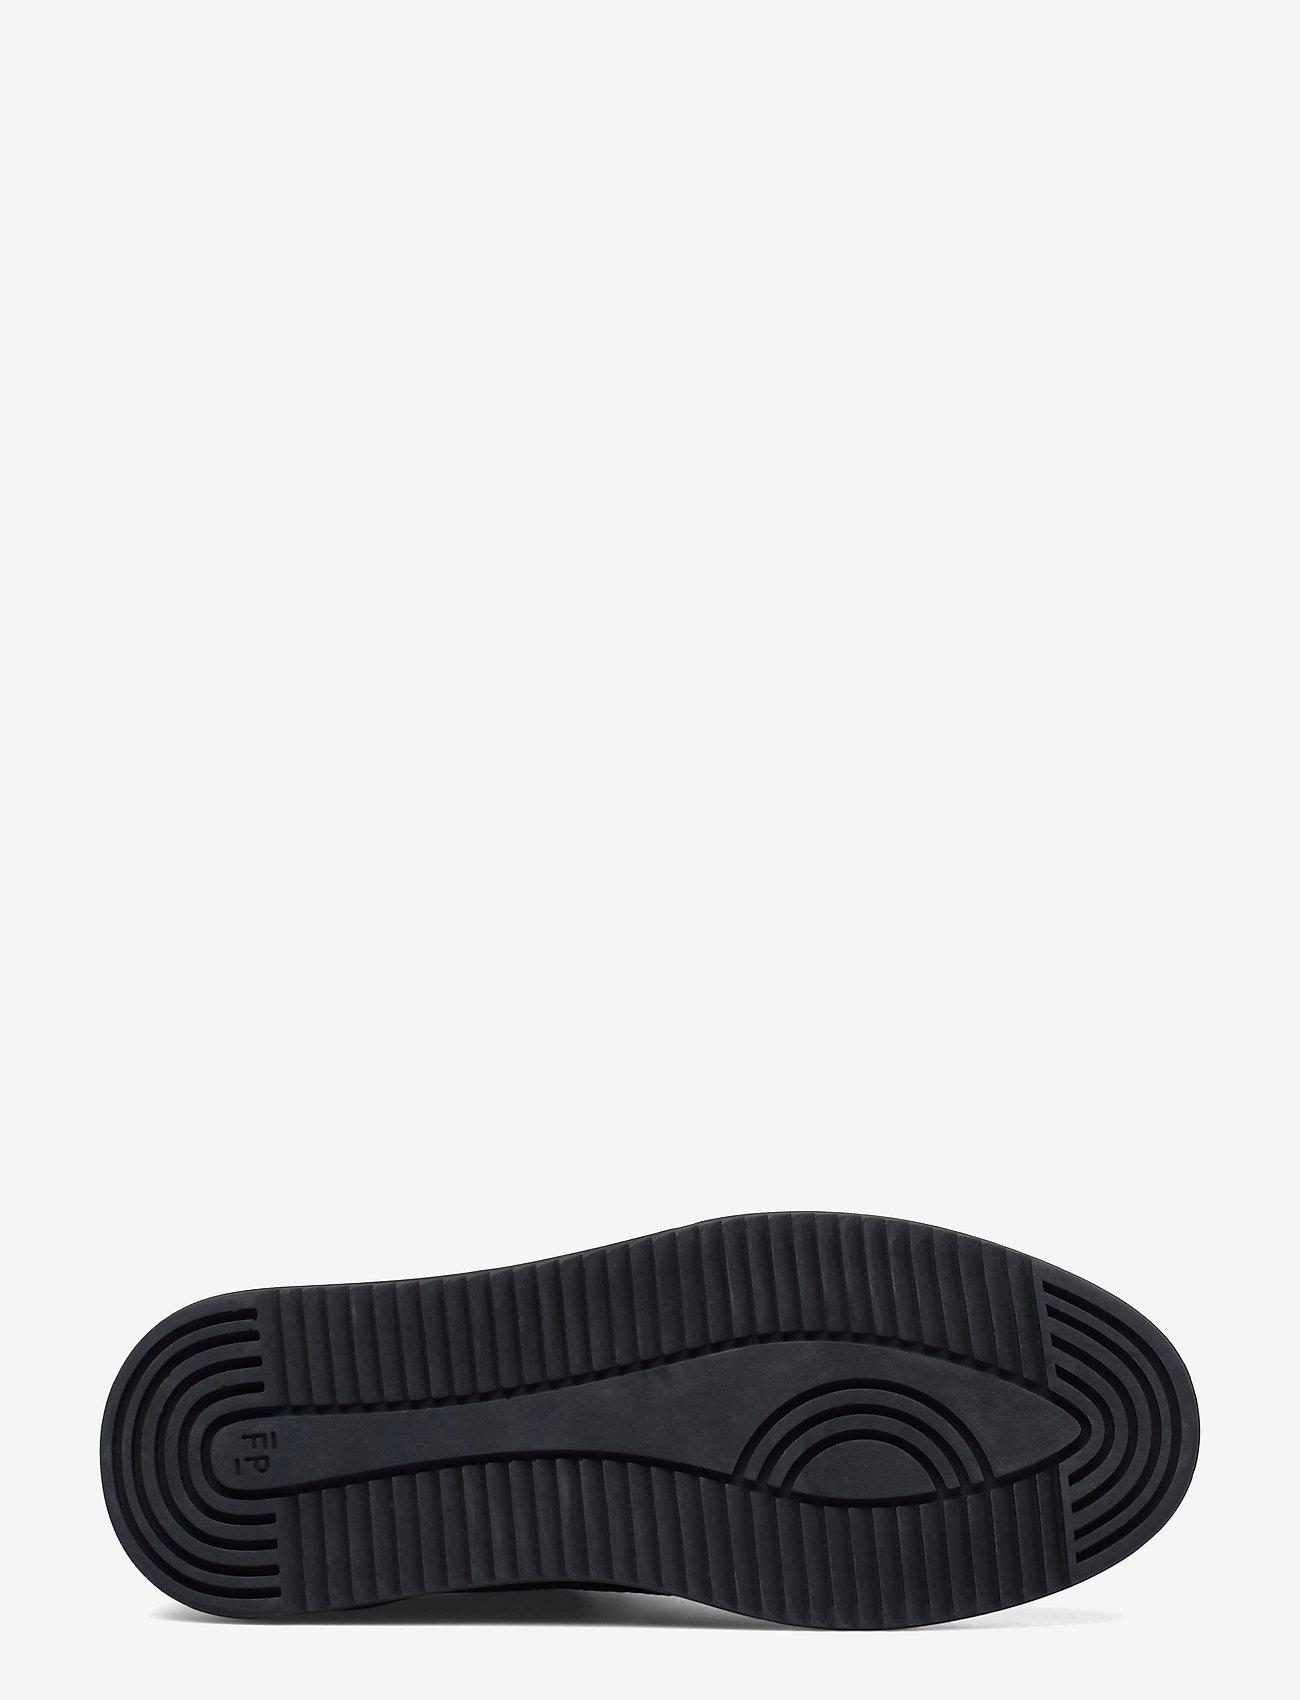 Filling Pieces - Mondo 2.0 Ripple Nubuck - låga sneakers - all black - 4